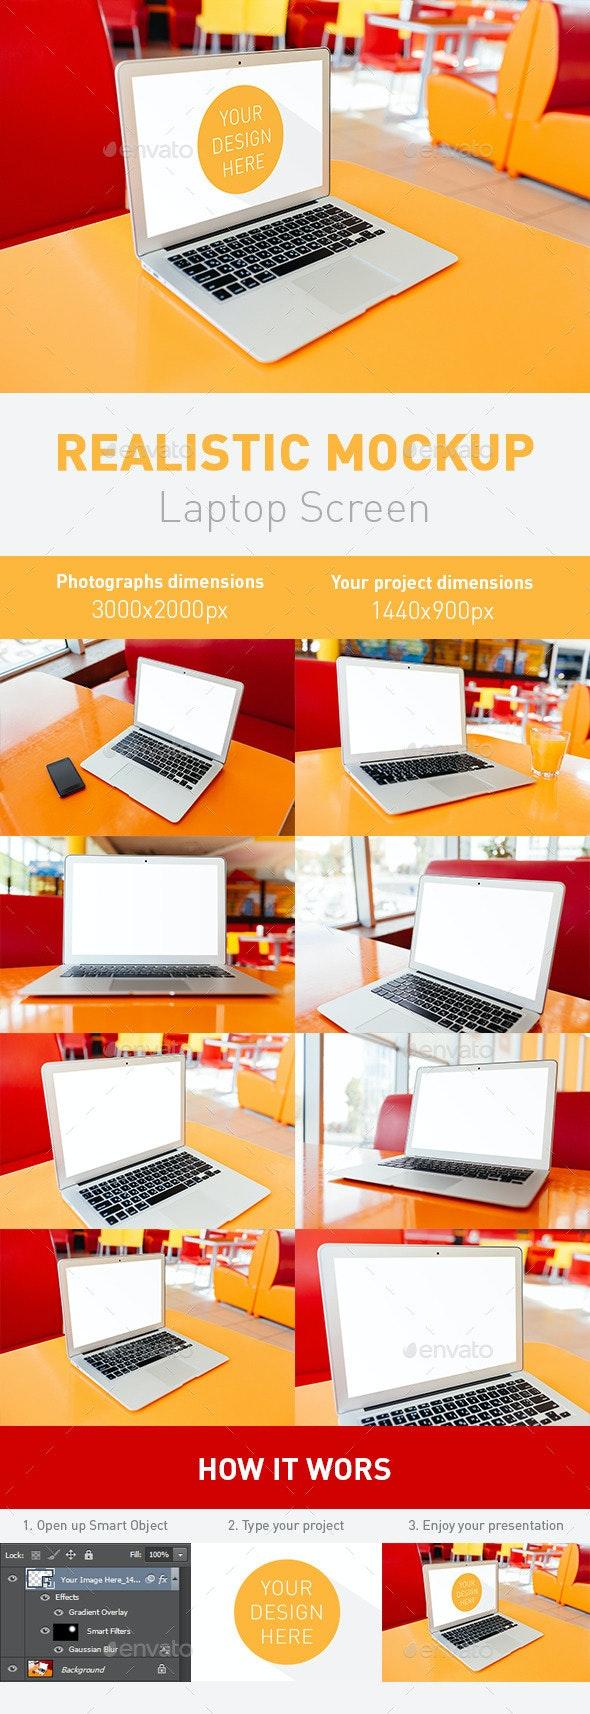 Realistic Laptop Screen Mockup - 8 PSD Files  - Laptop Displays